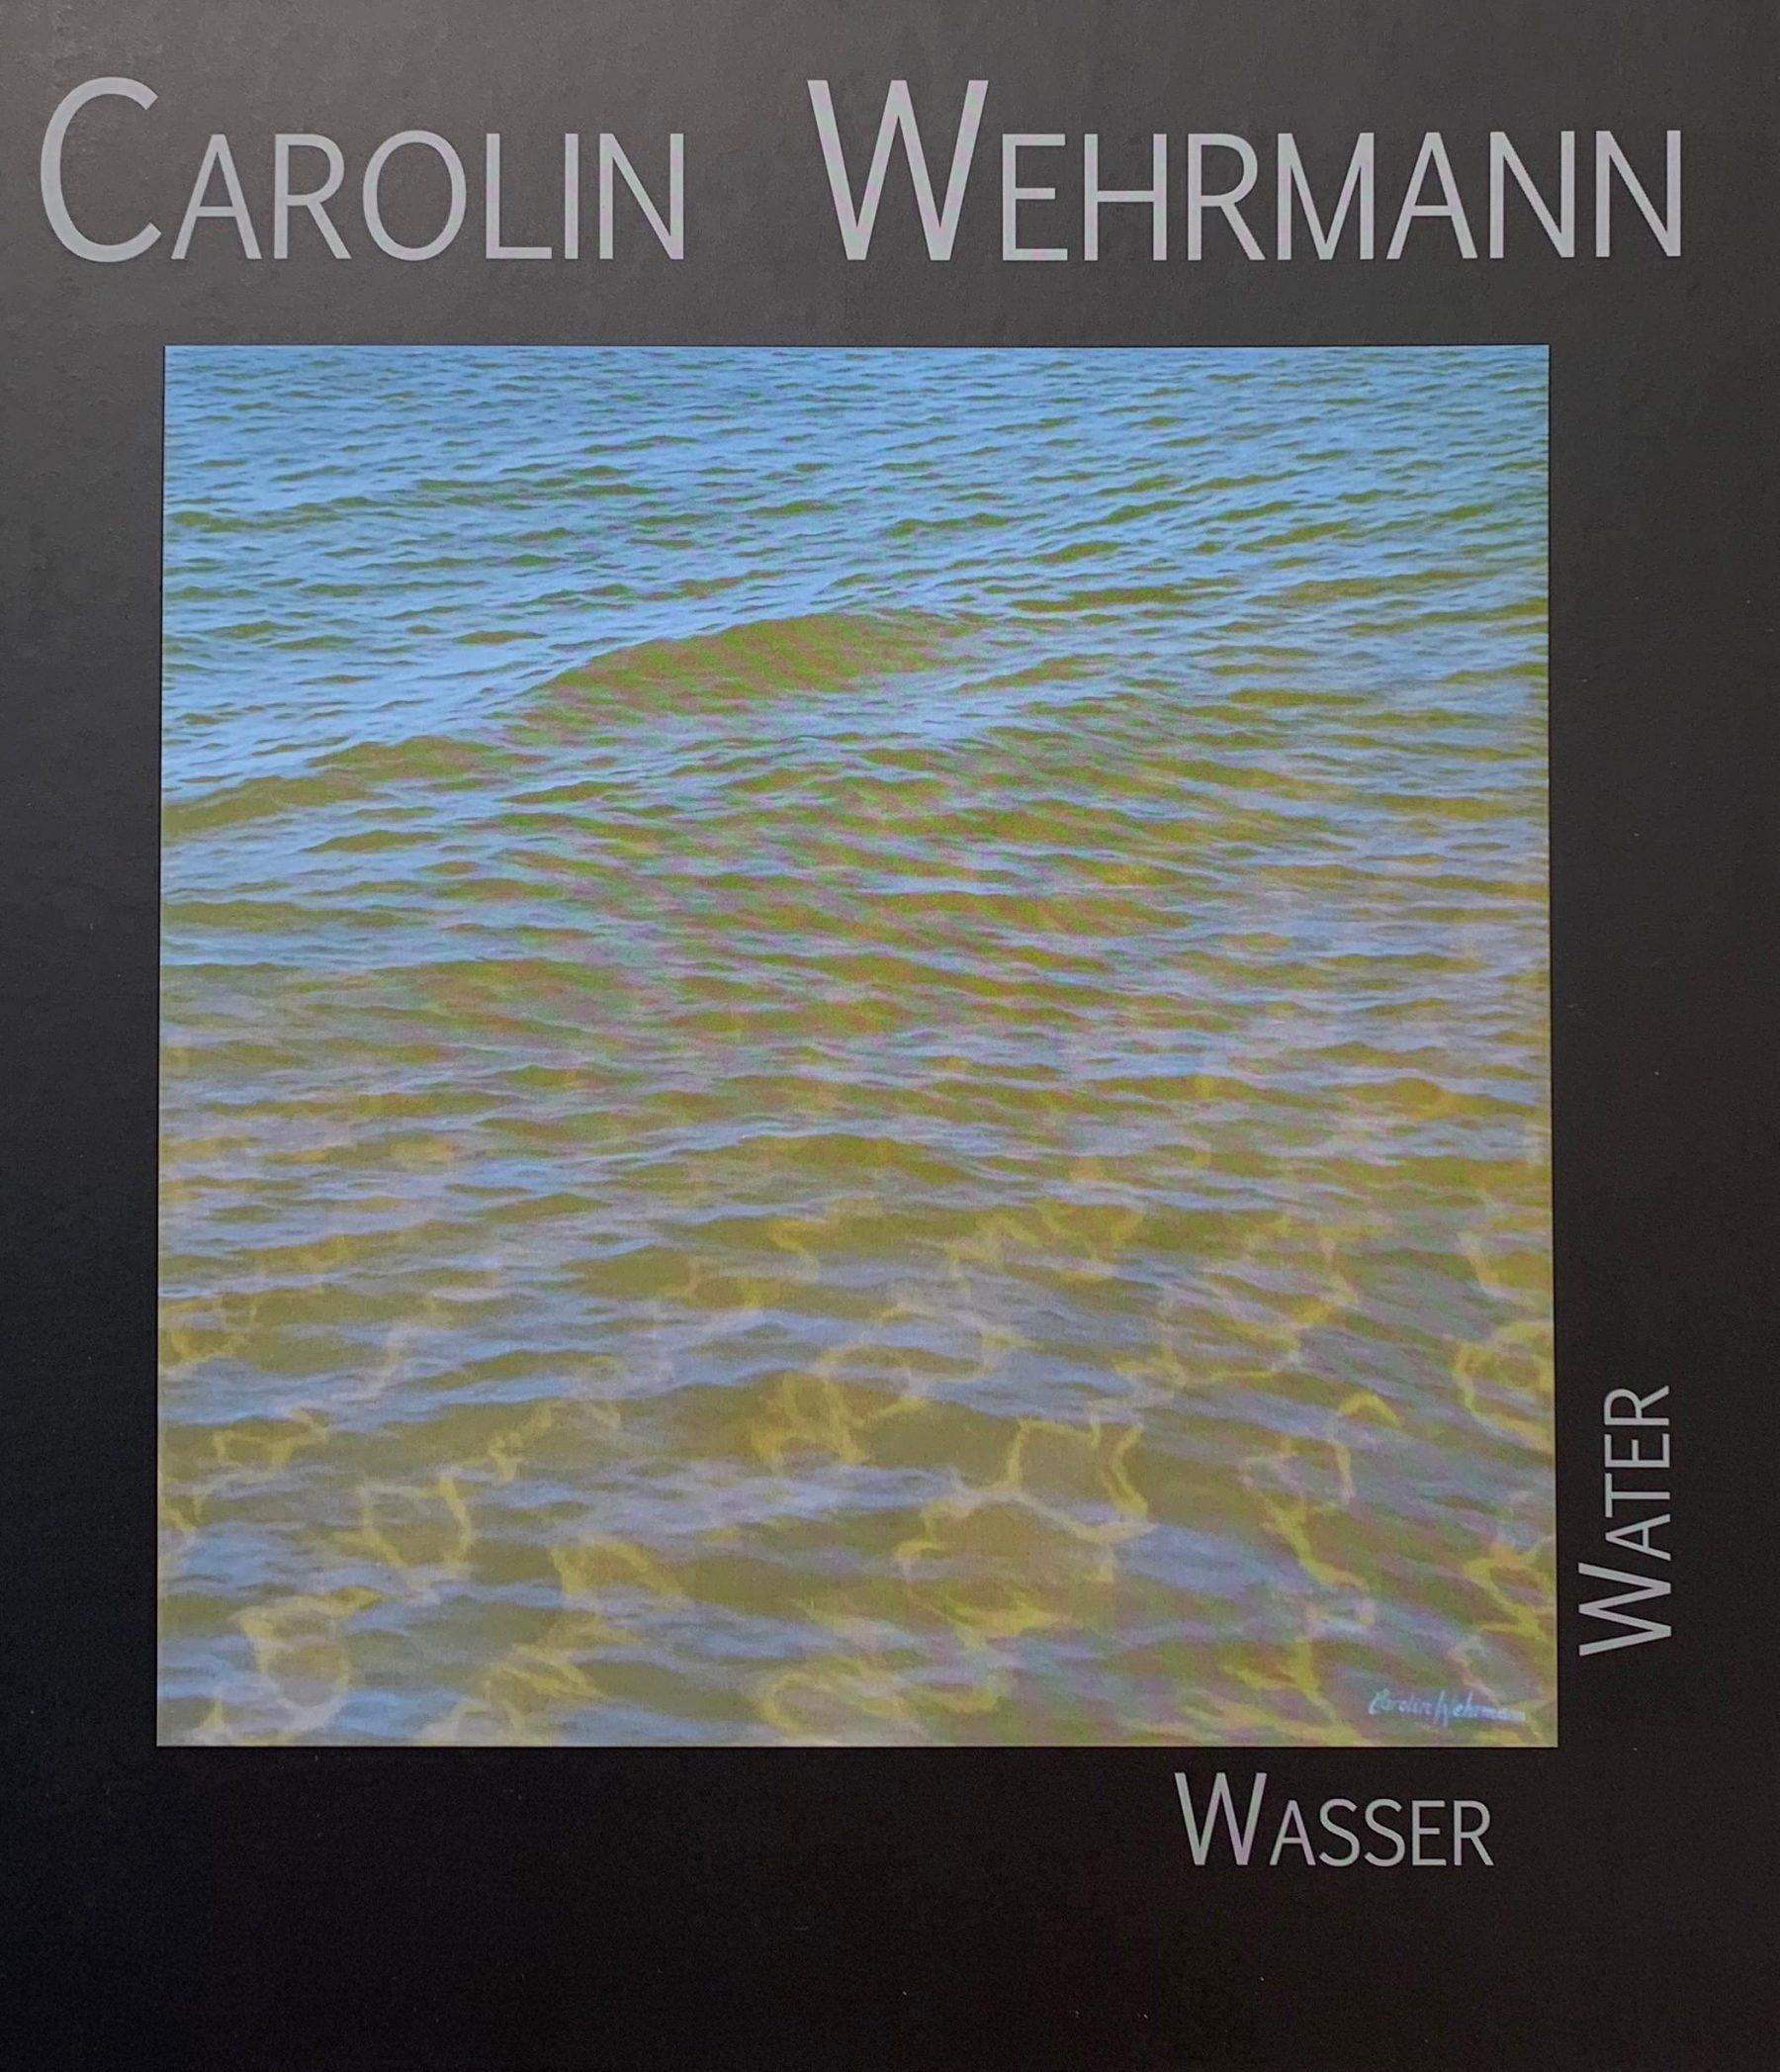 Wasser - Meer - Wehrmann, Carolin - B-CW